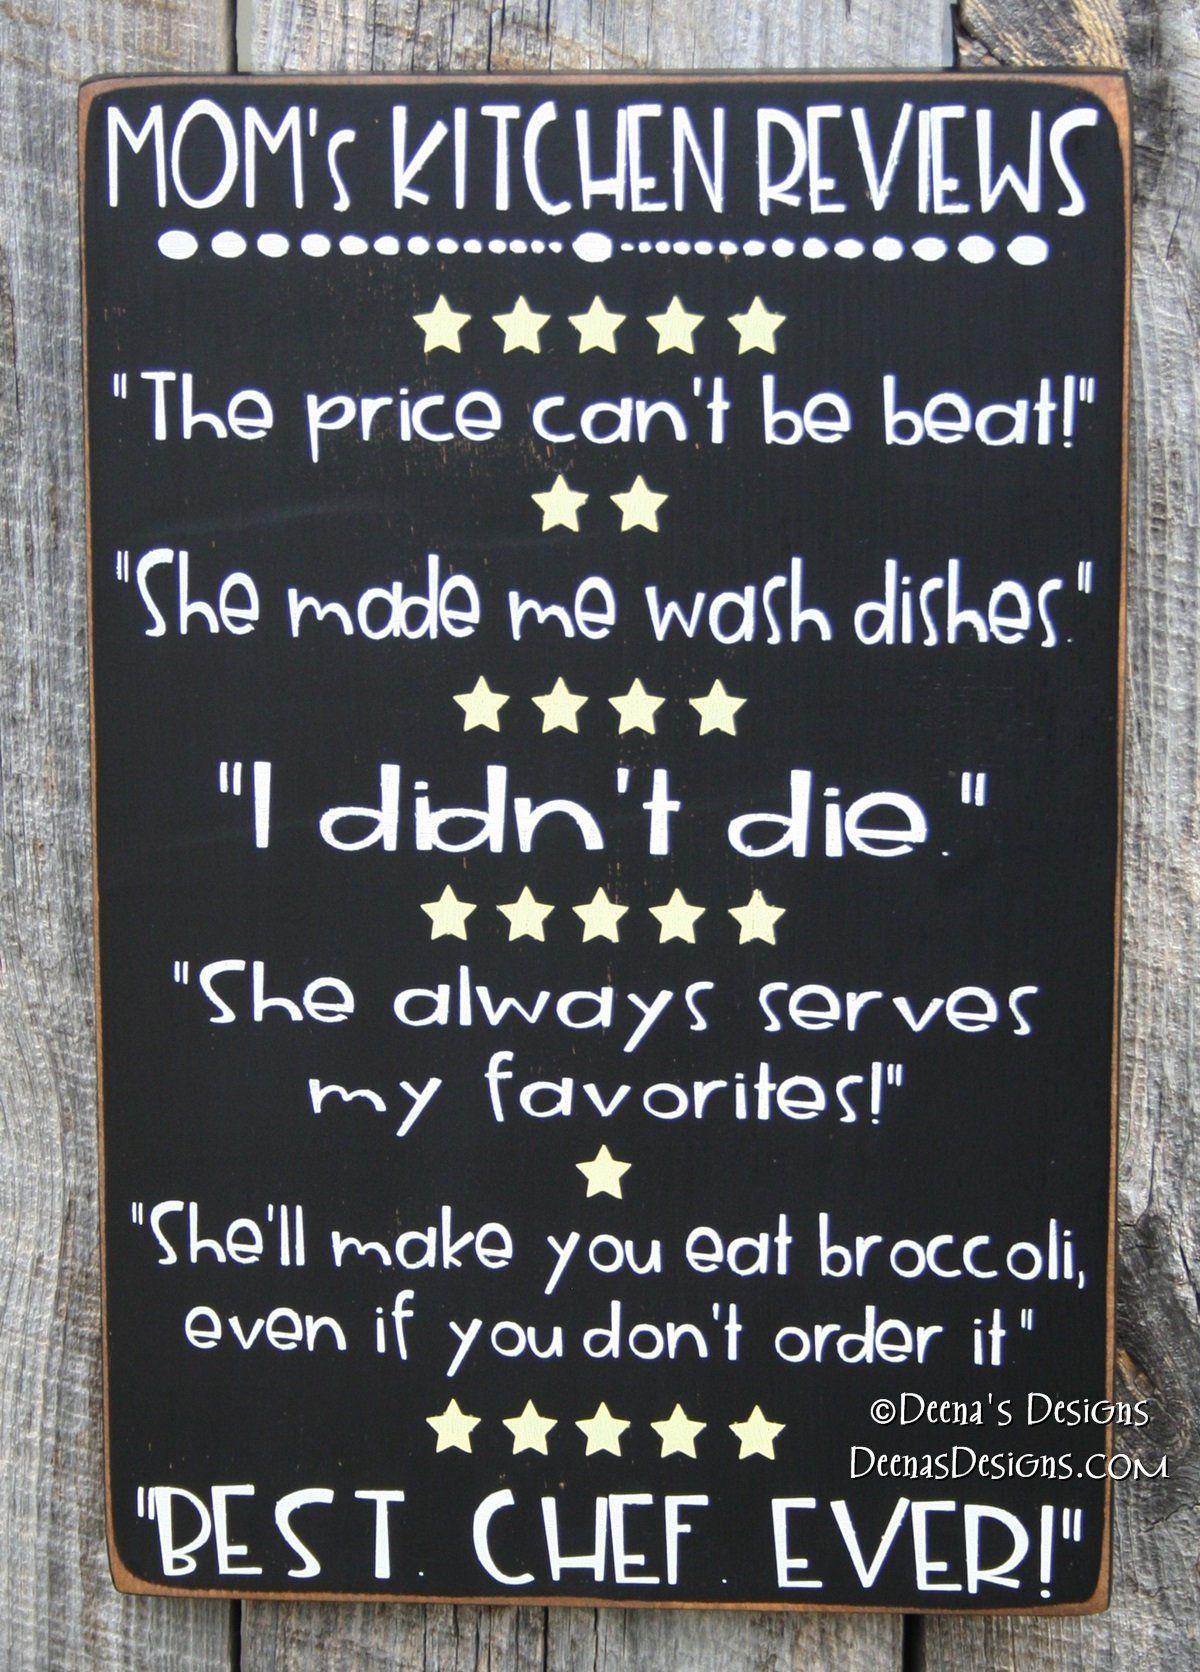 mom's kitchen reviews sign, kitchen reviews, kitchen sign